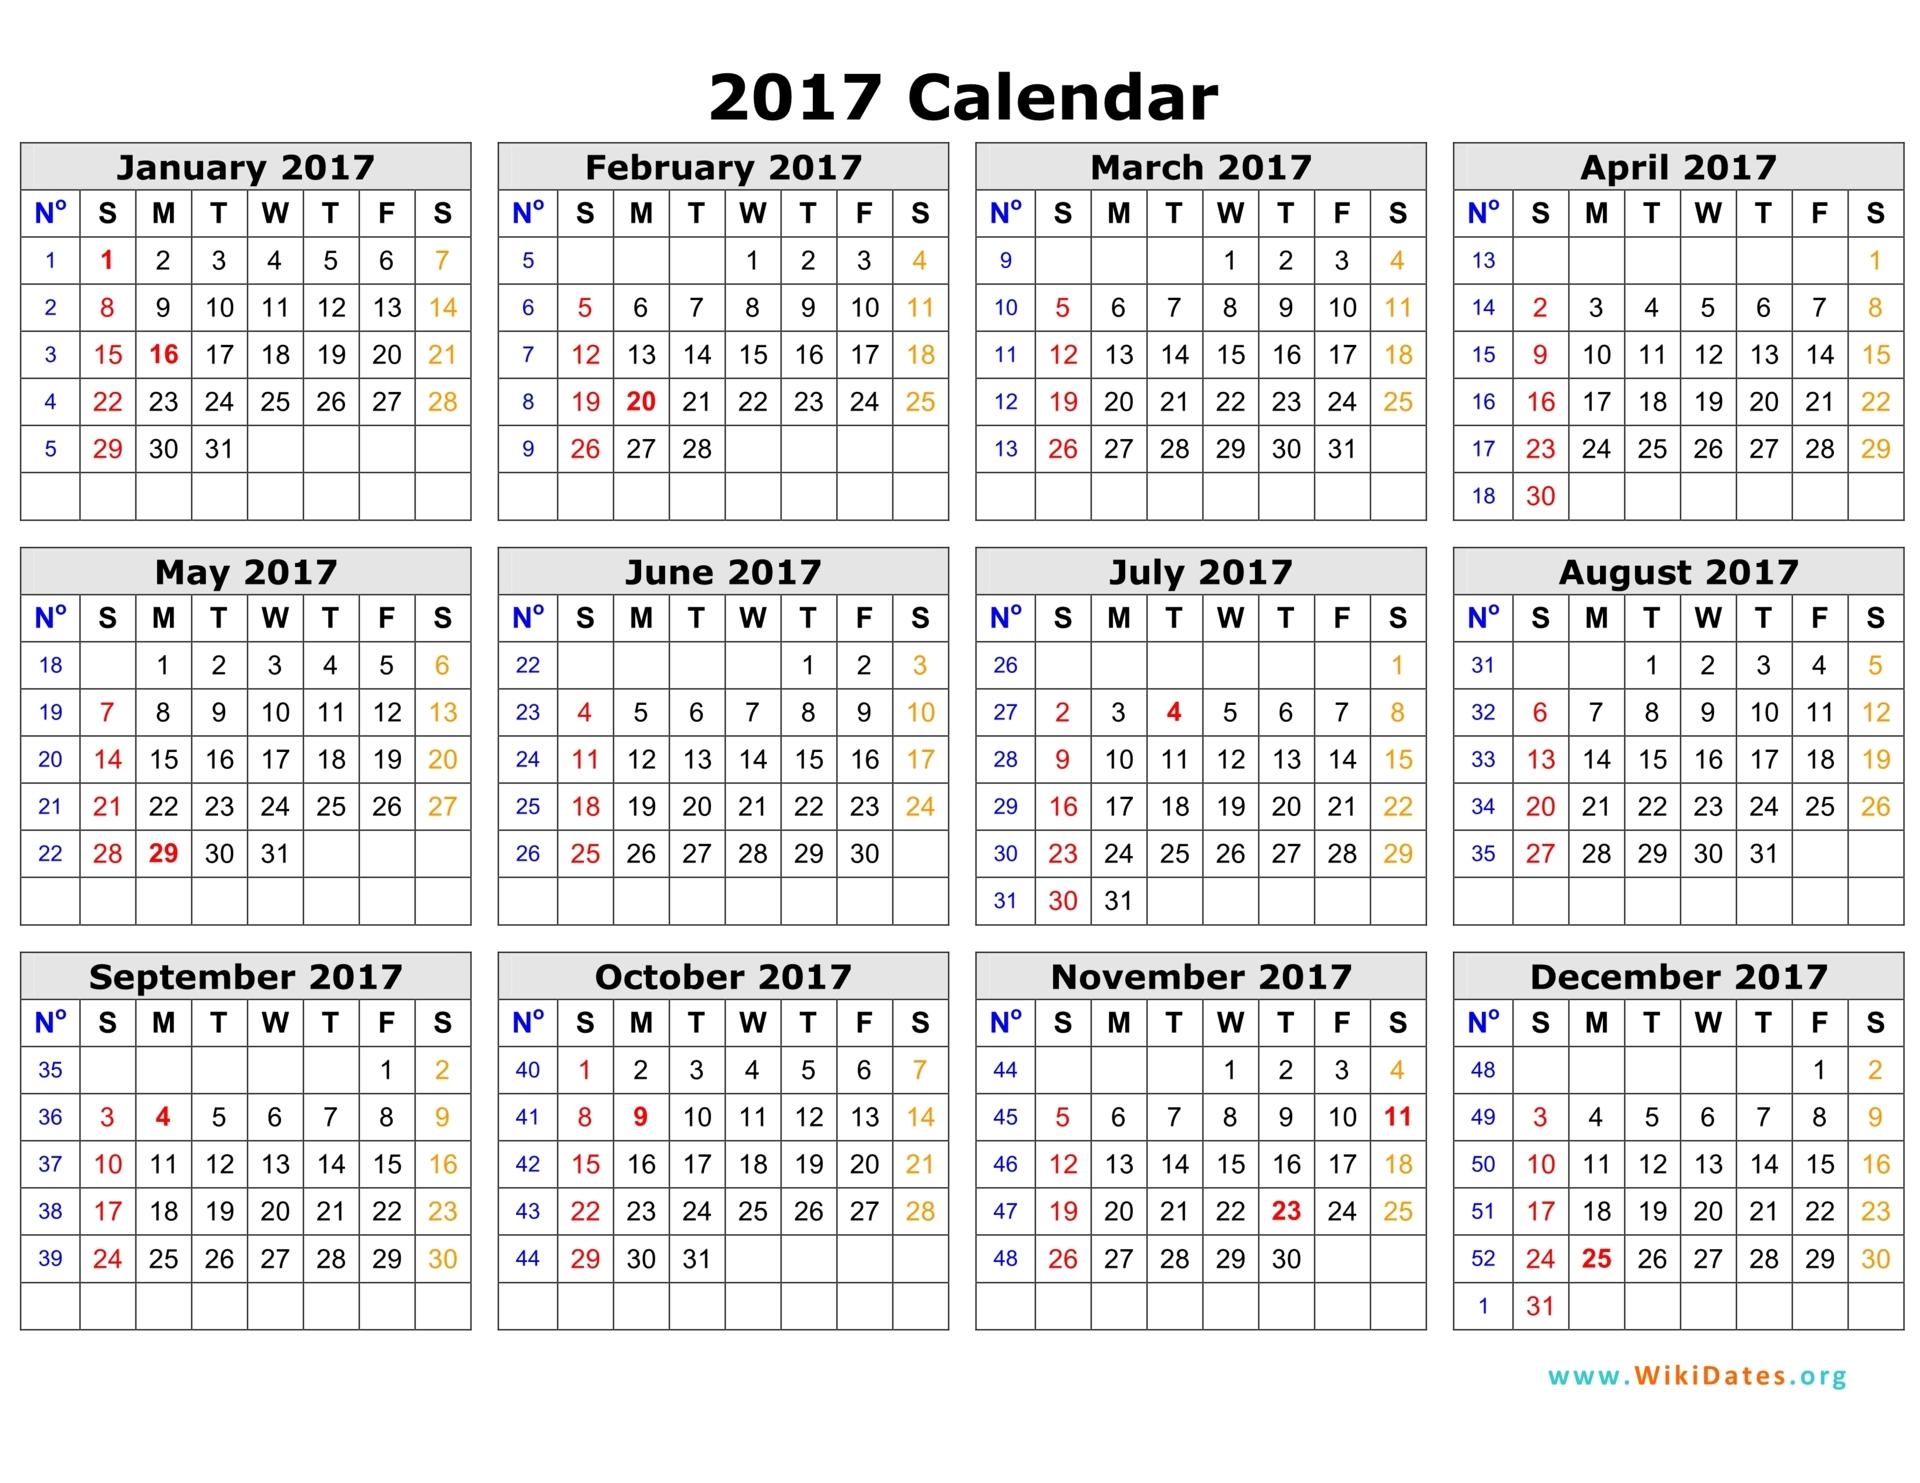 2017-calendar-template-04.jpg